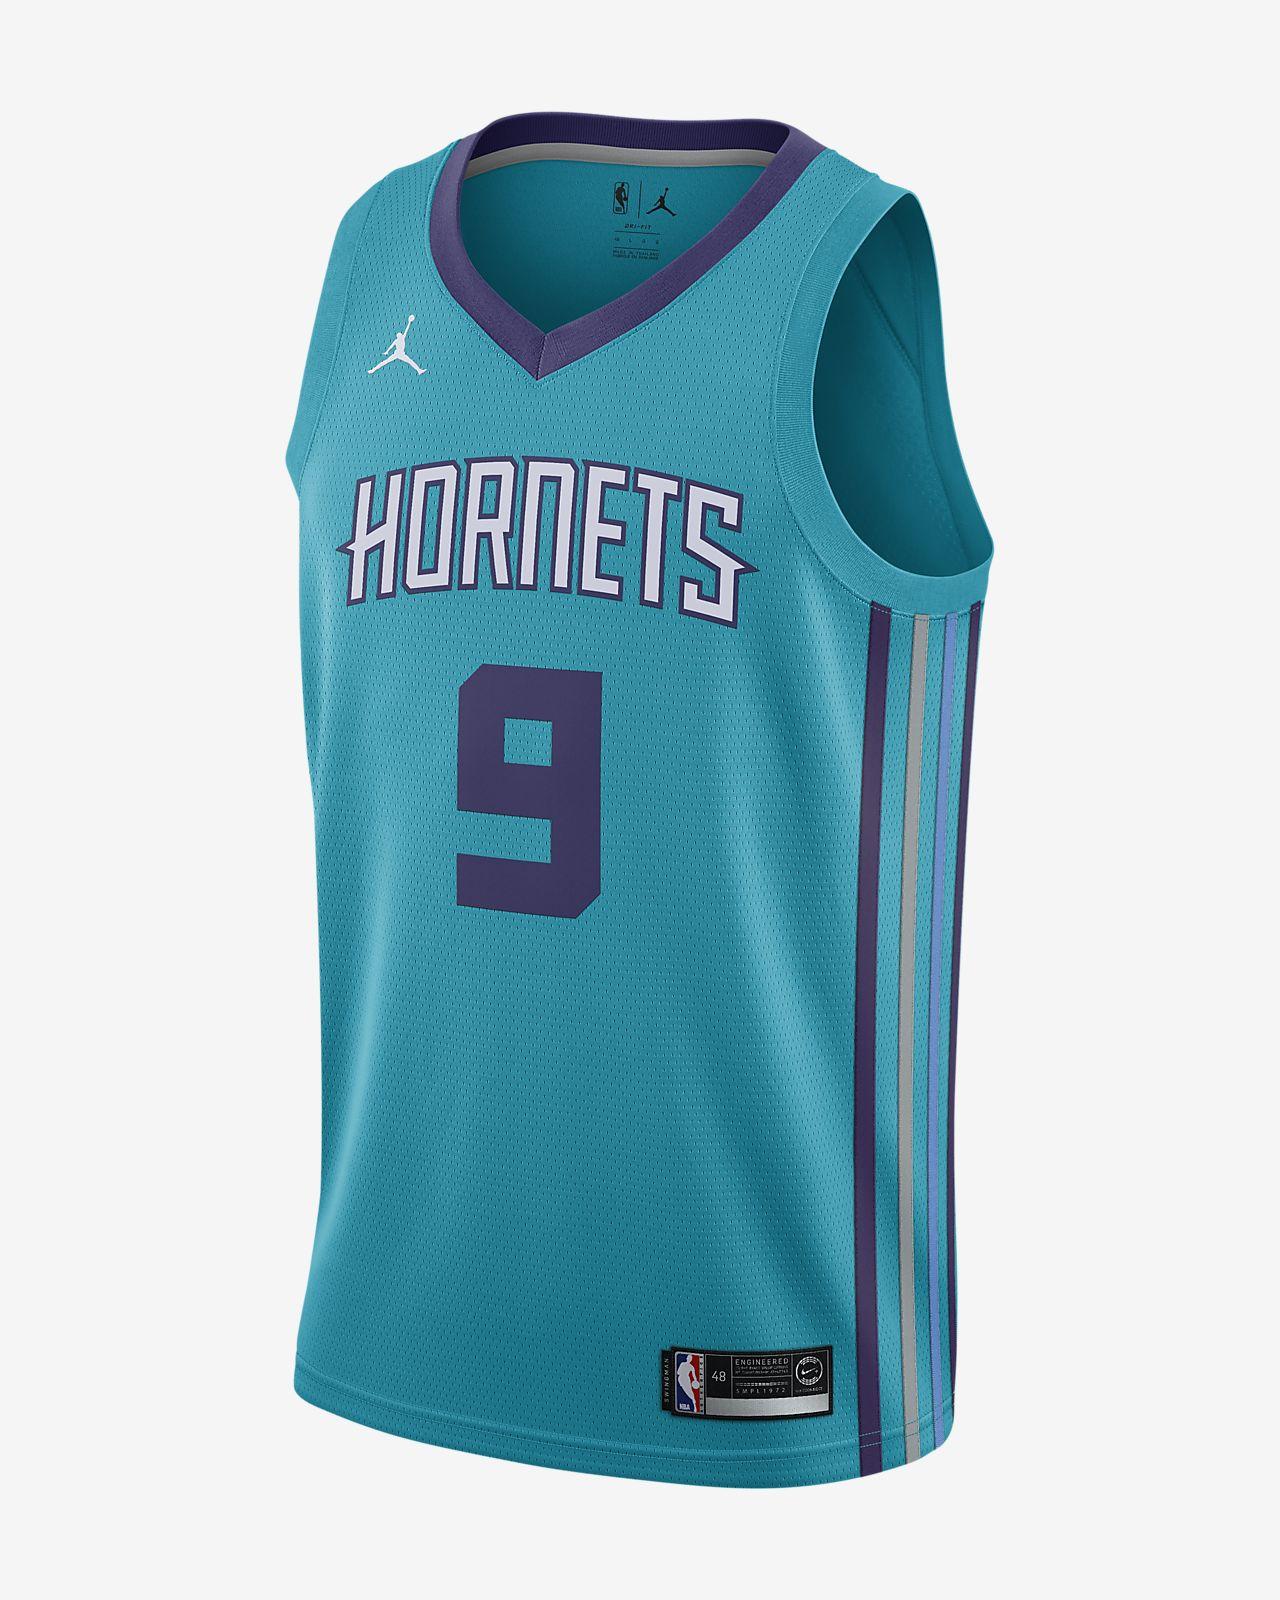 Maglia Jordan NBA Connected Icon Edition Swingman (Charlotte Hornets) - Uomo